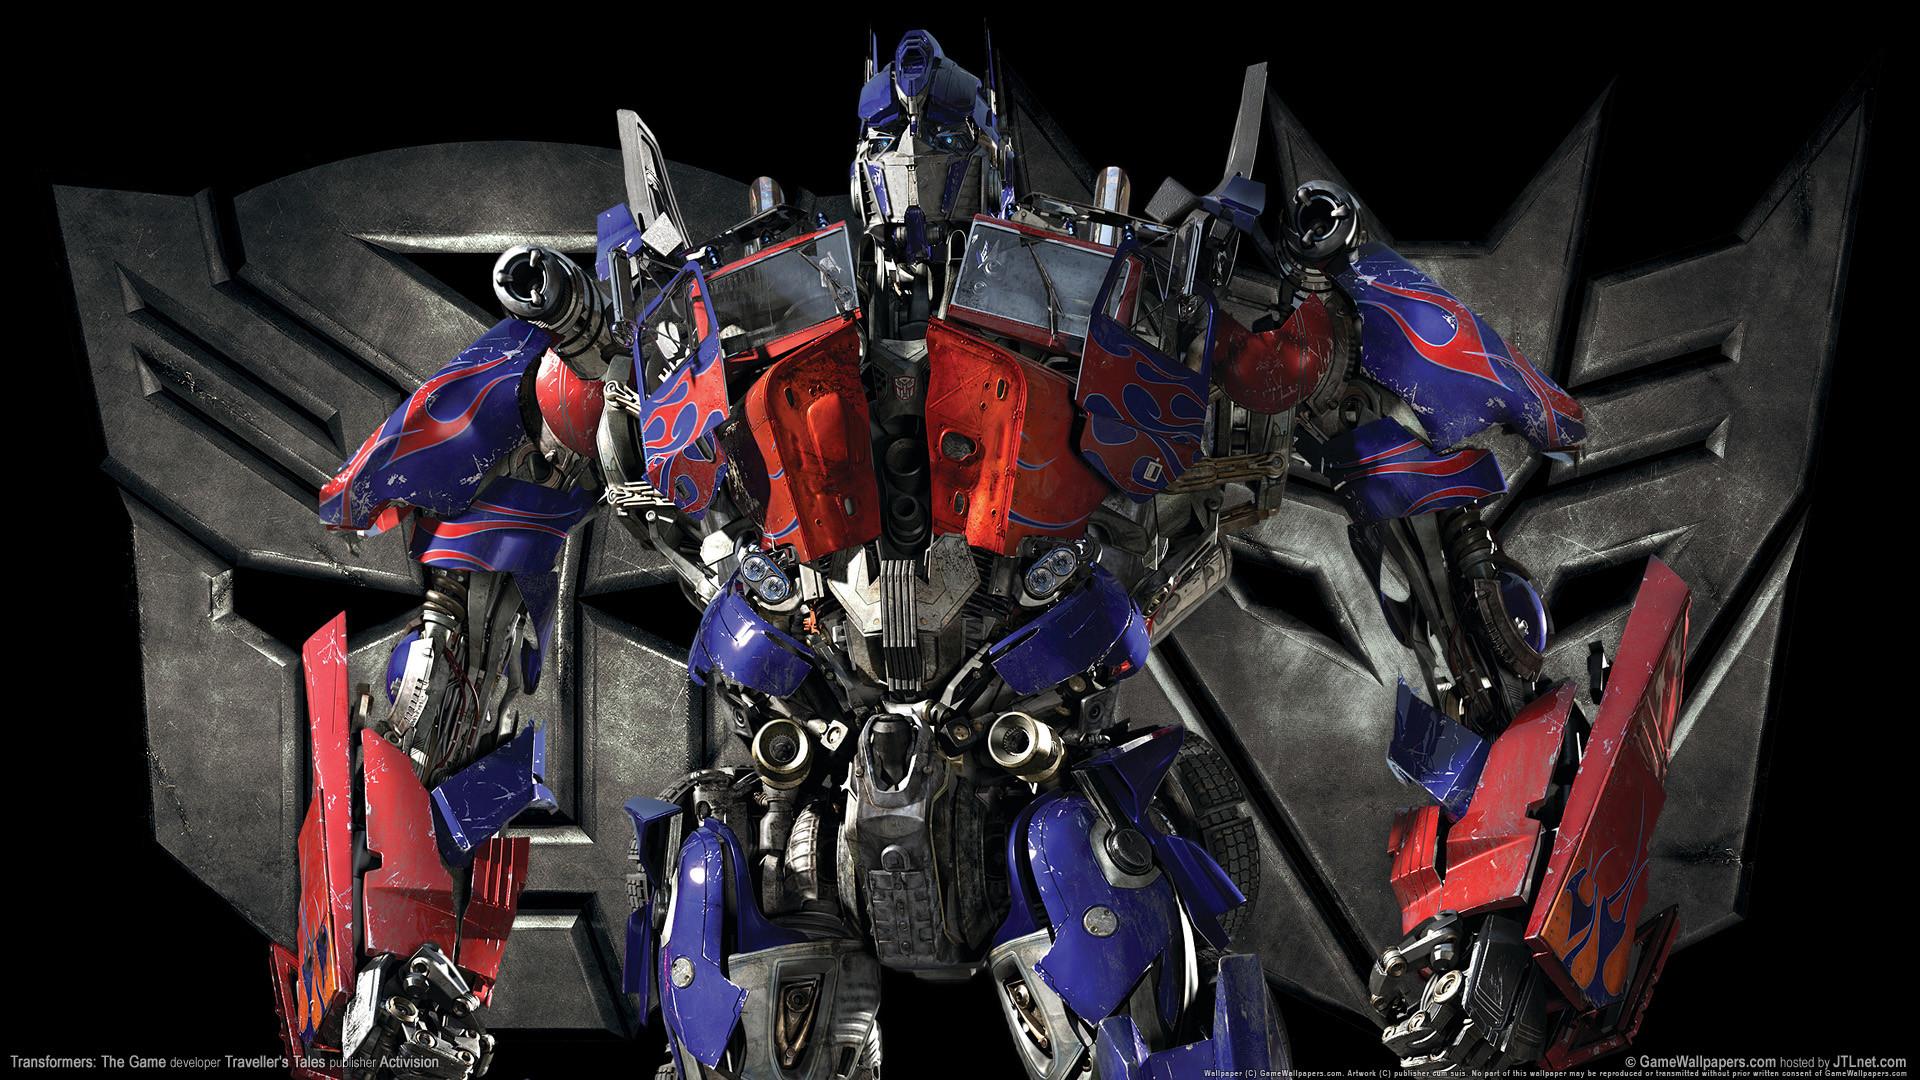 Transformers Optimus Prime Game Wallpapers - Gambar Transformers Optimus Prime - HD Wallpaper